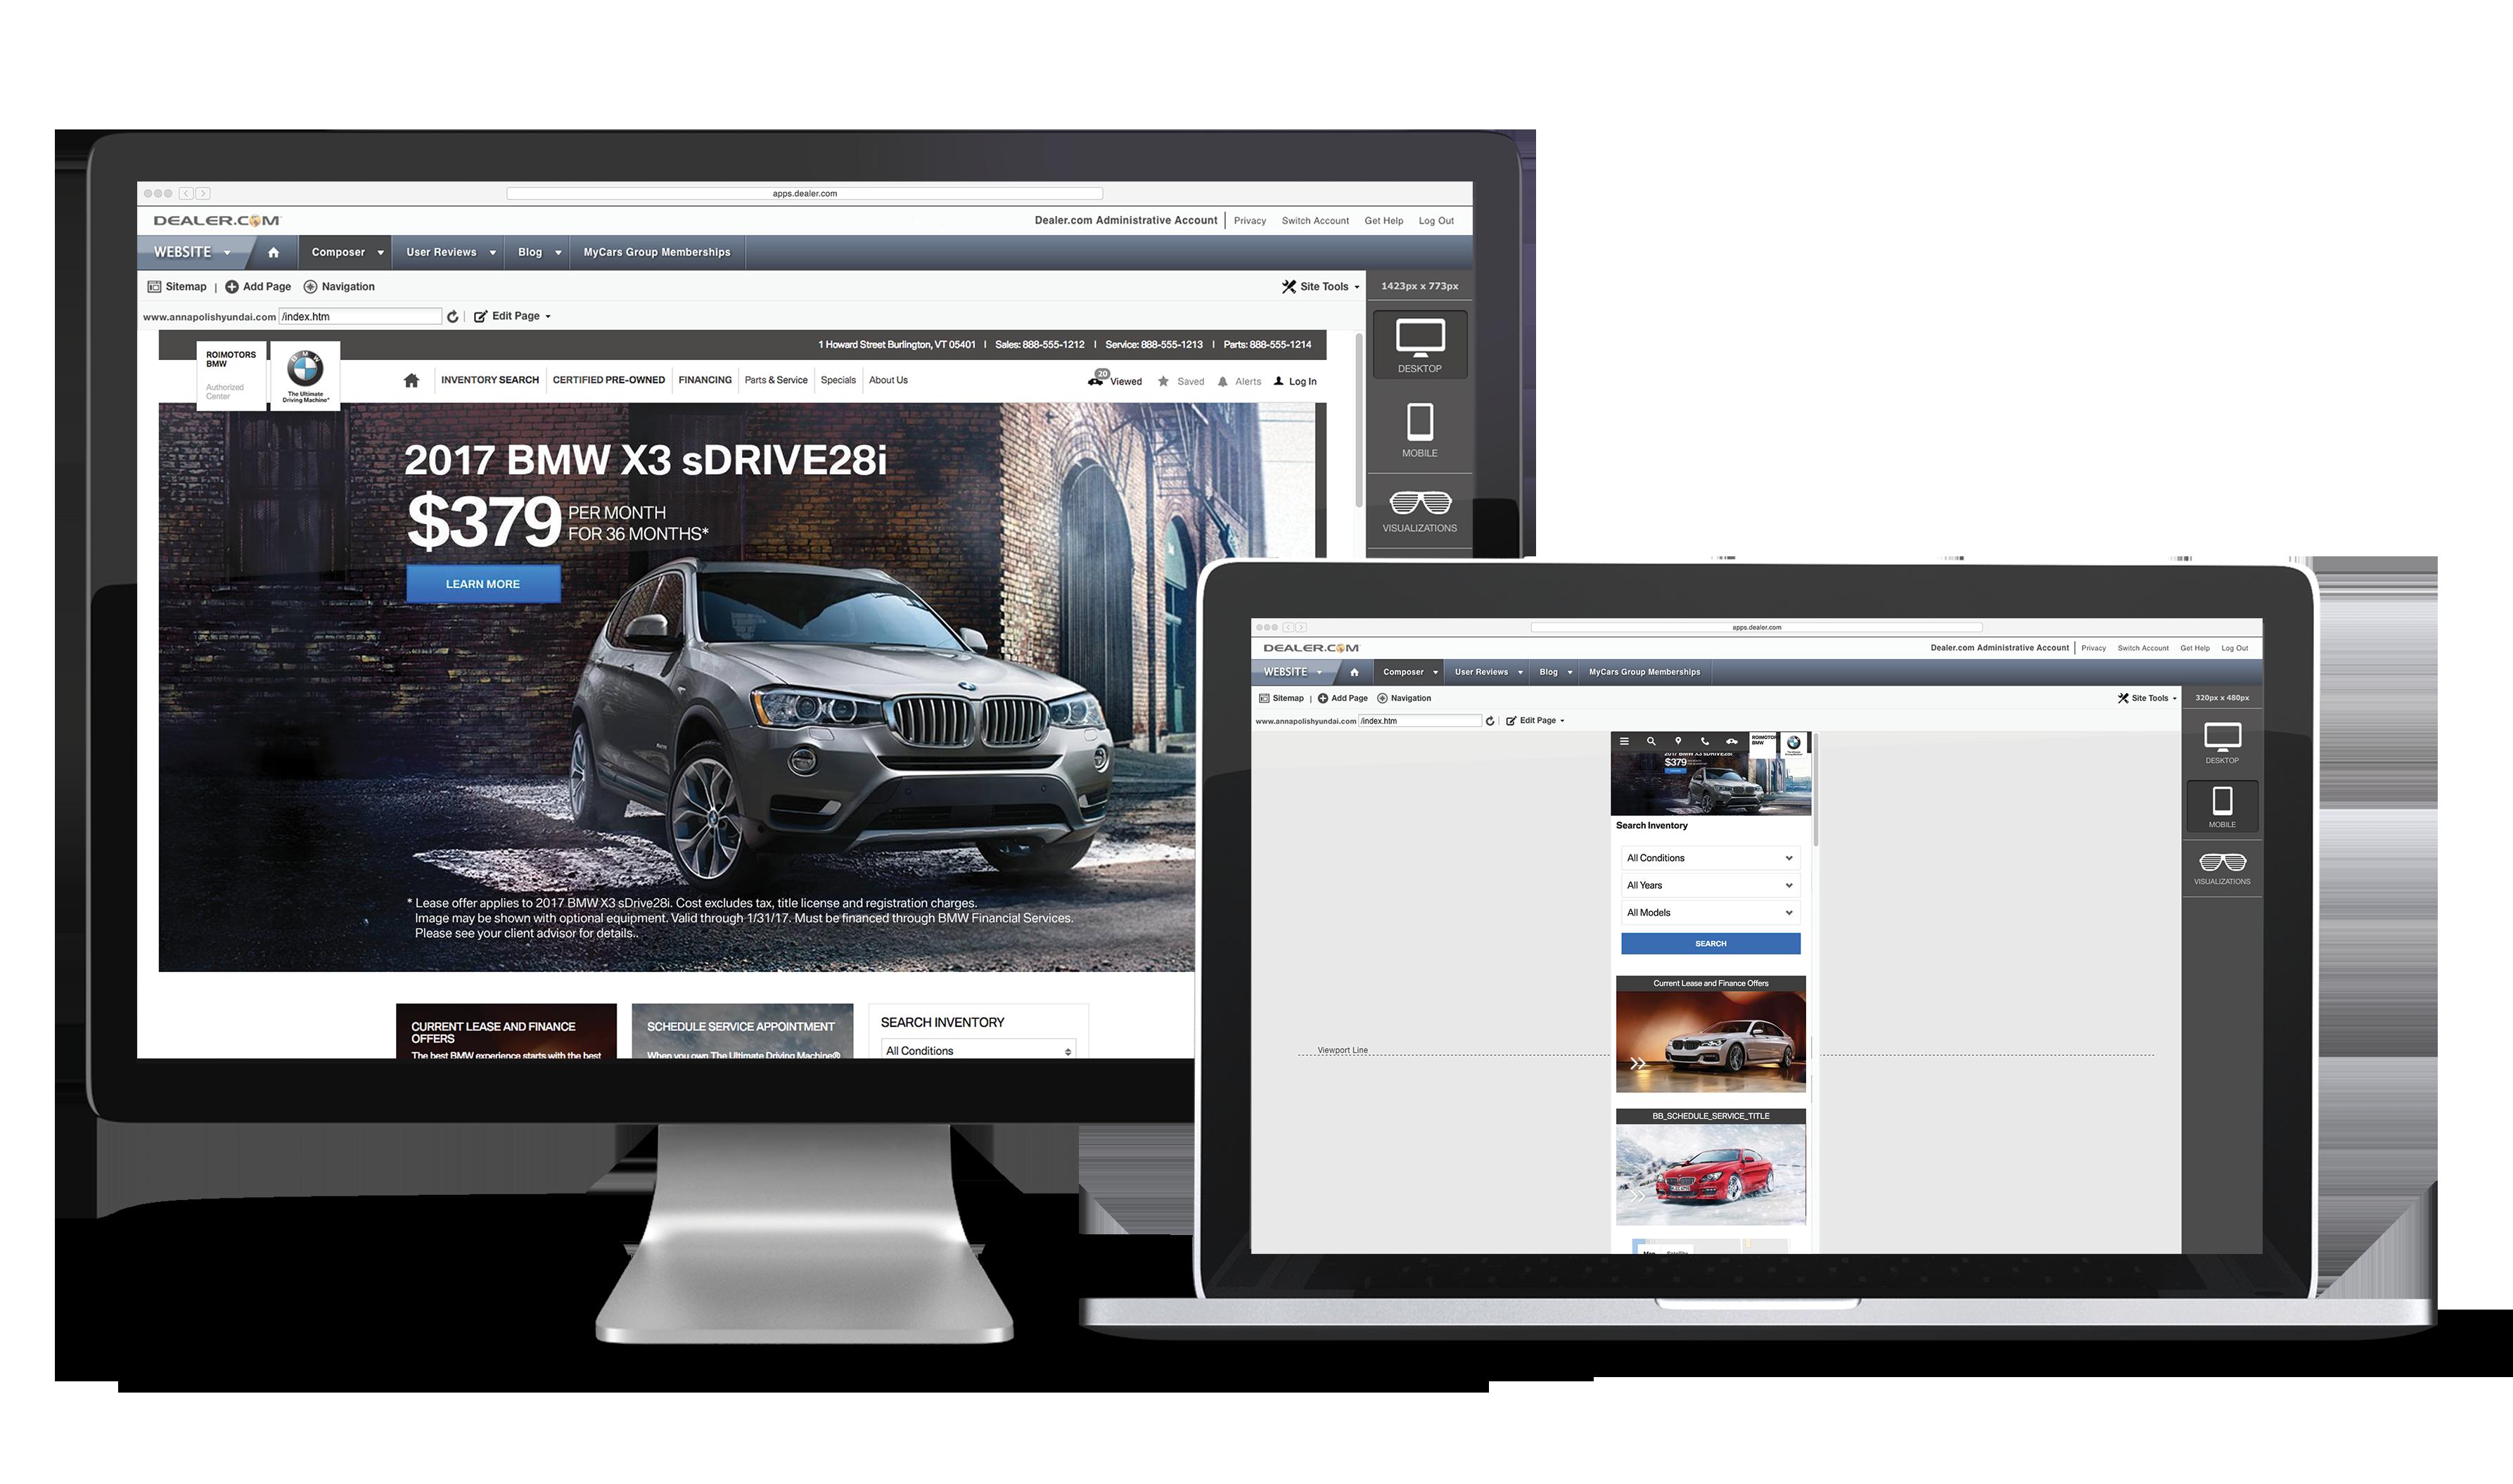 Dealer.com BMW Websites Centralized Control